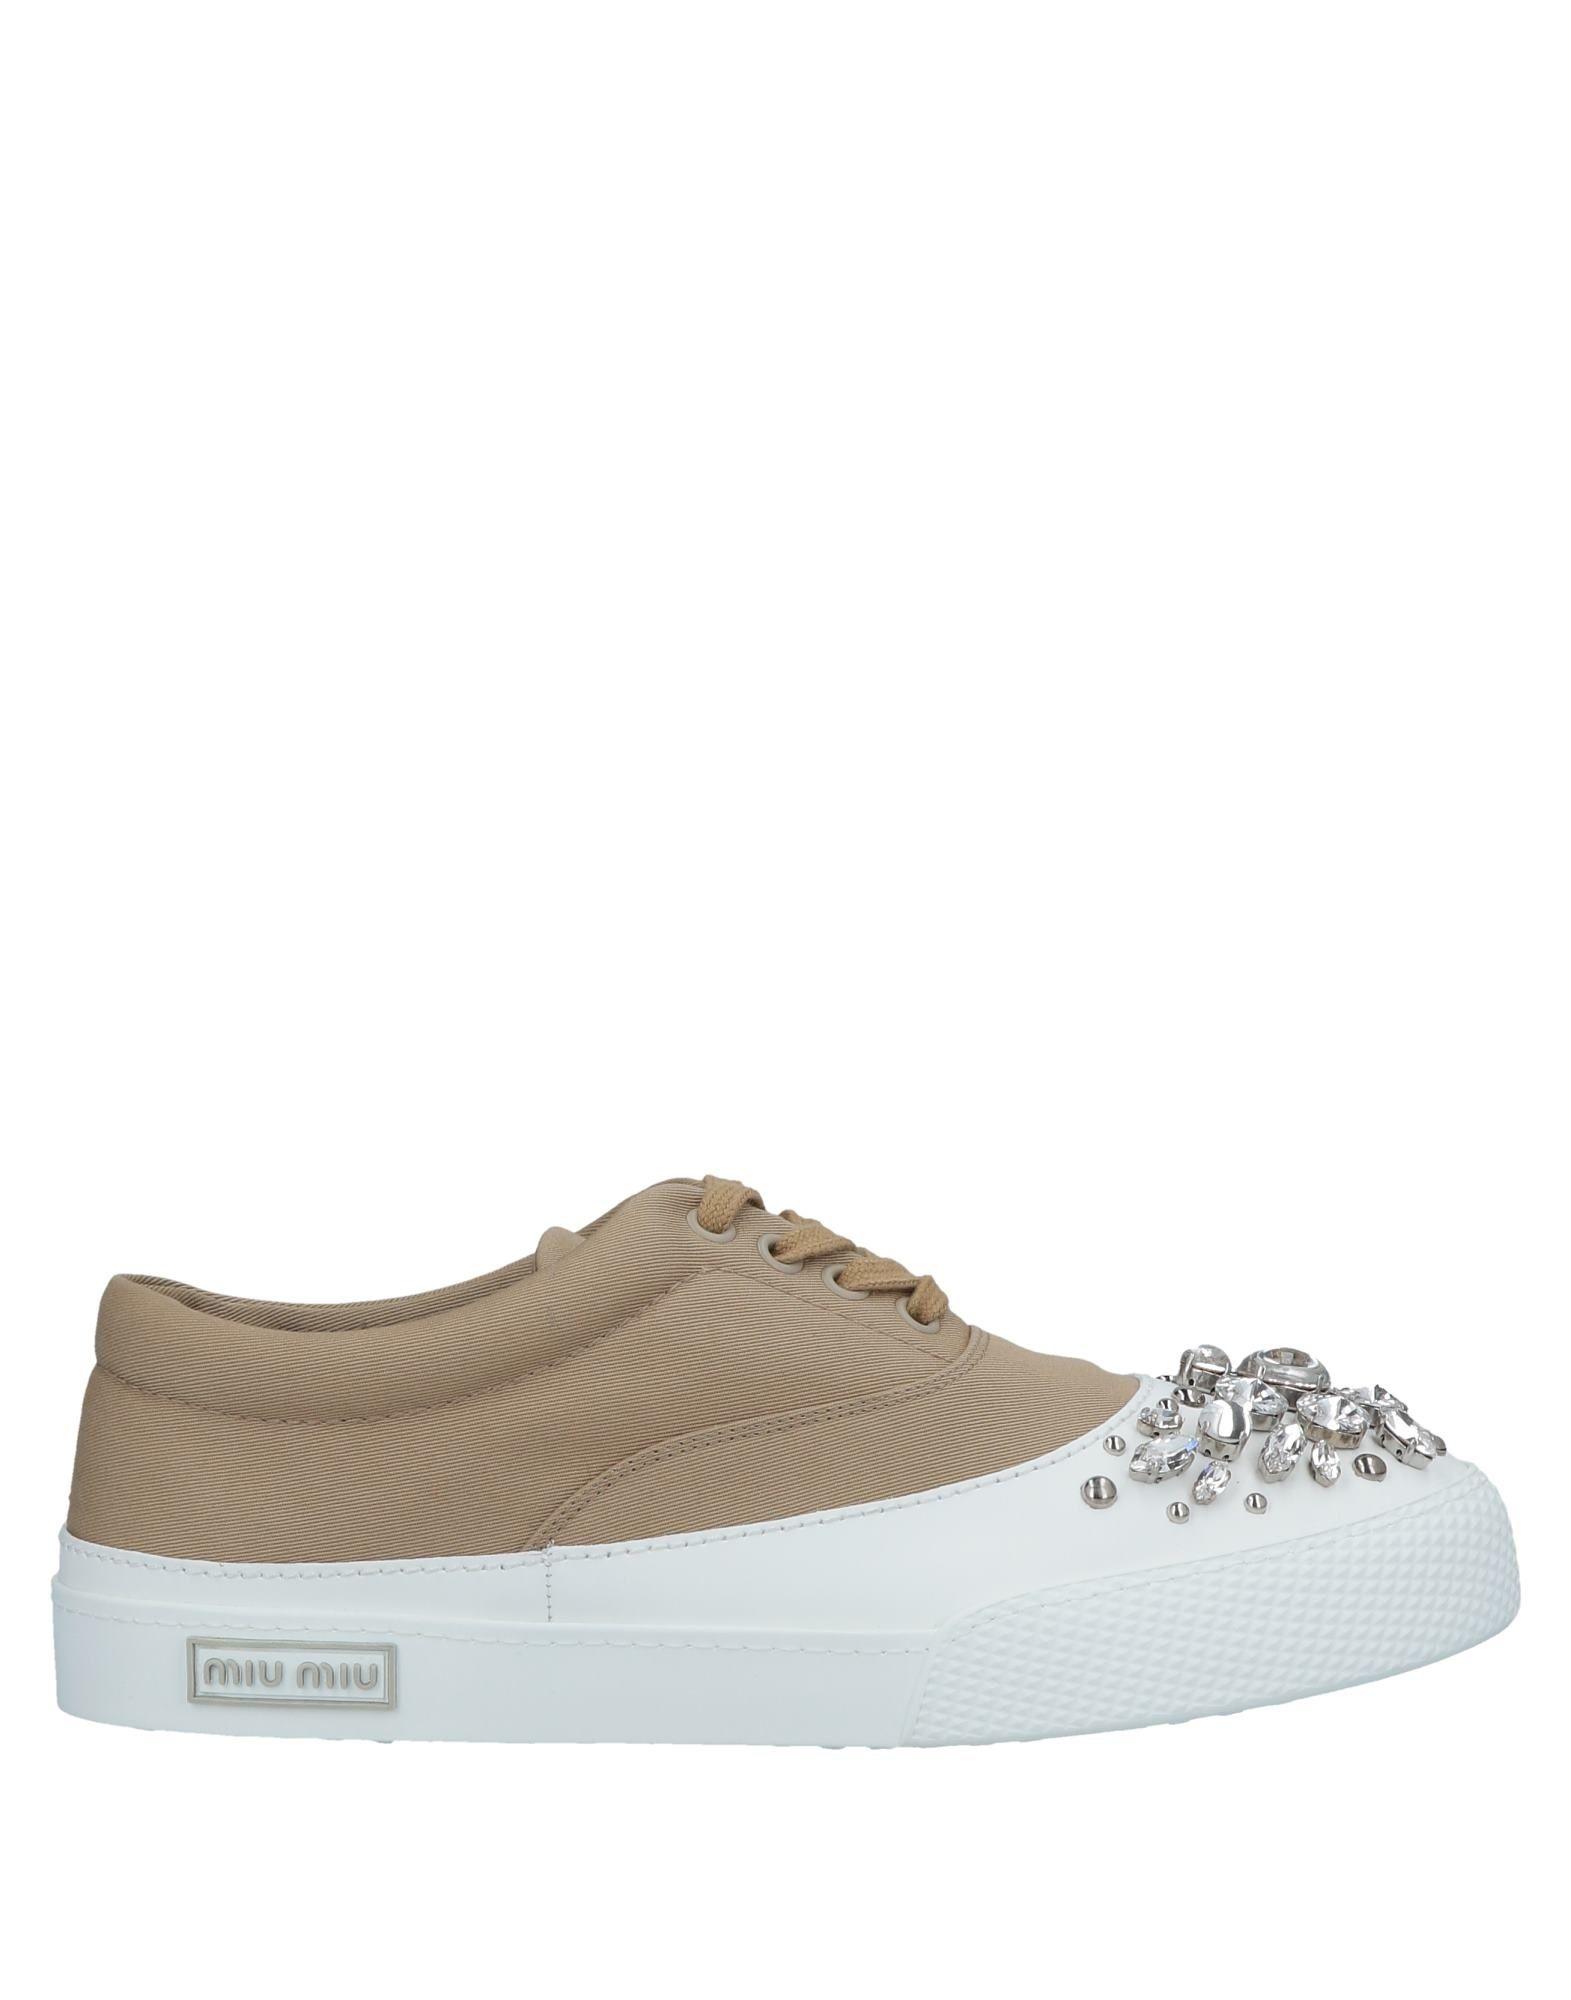 2dfba083b6a9 Miu Miu Sneakers - Women Miu Miu Sneakers online on YOOX United ...